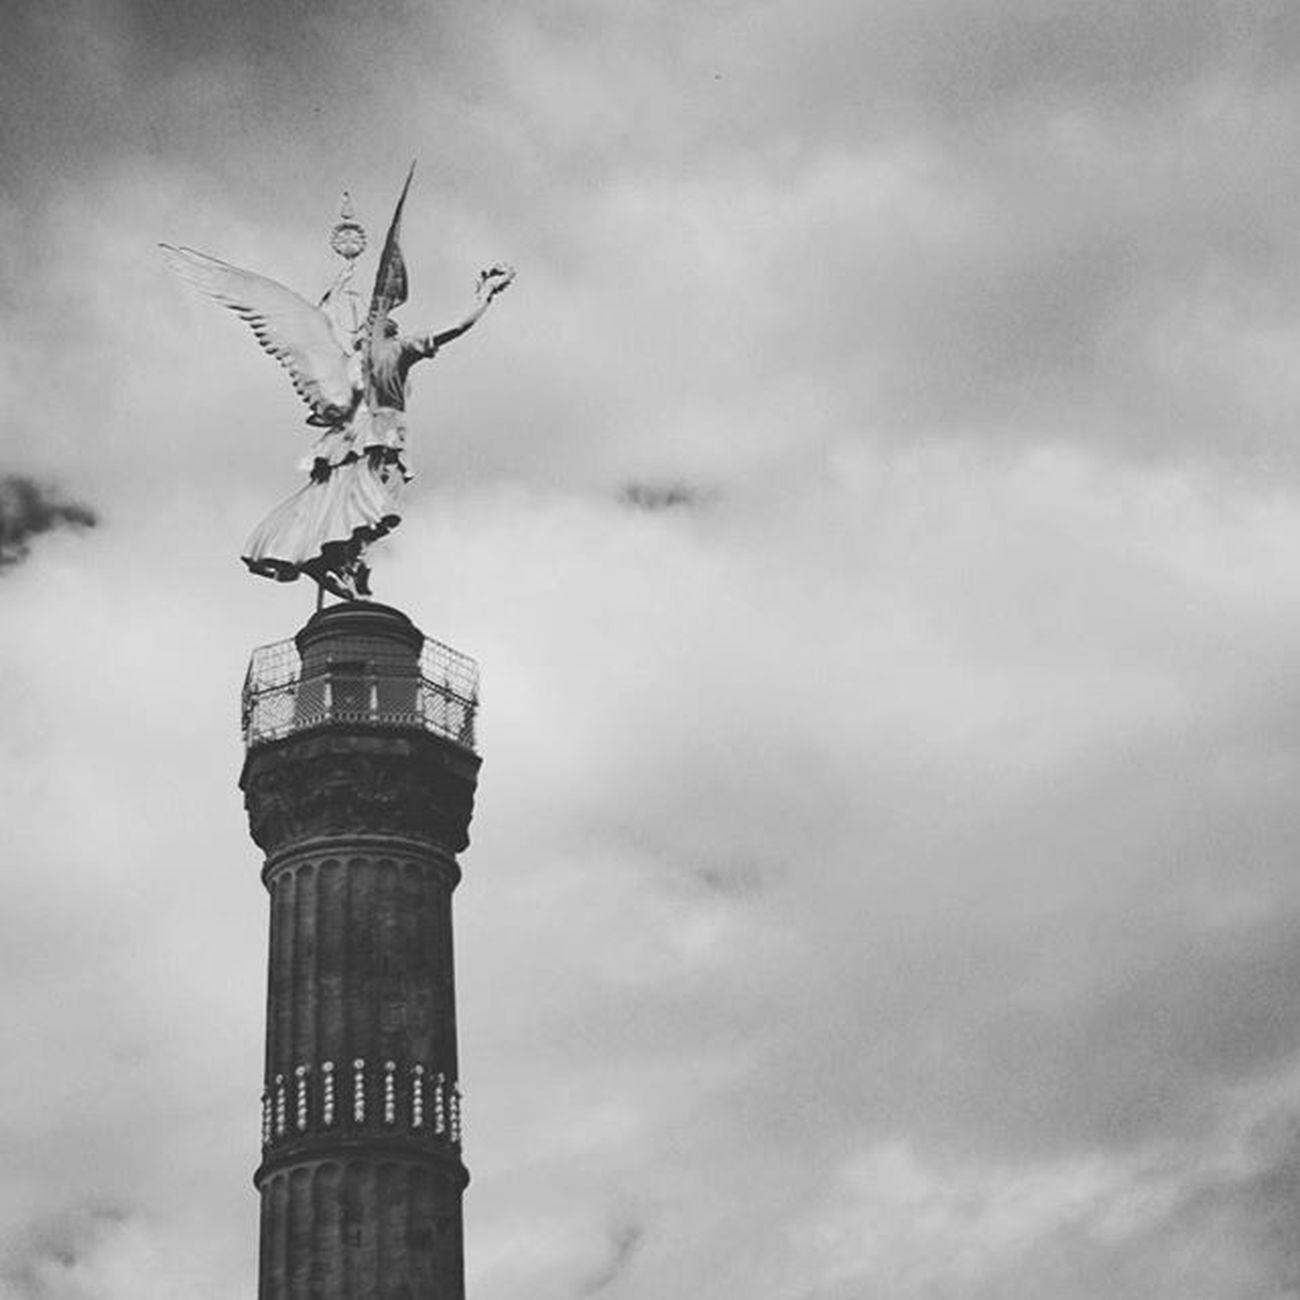 Beautiful Monument and Landmark . The Victorycolumn SiegesSäule at GroßerStern . berlin Deutschland Germany . Taken by my SonyAlpha dslr dslt a57 . تذكار معلم سياحي برلين المانيا